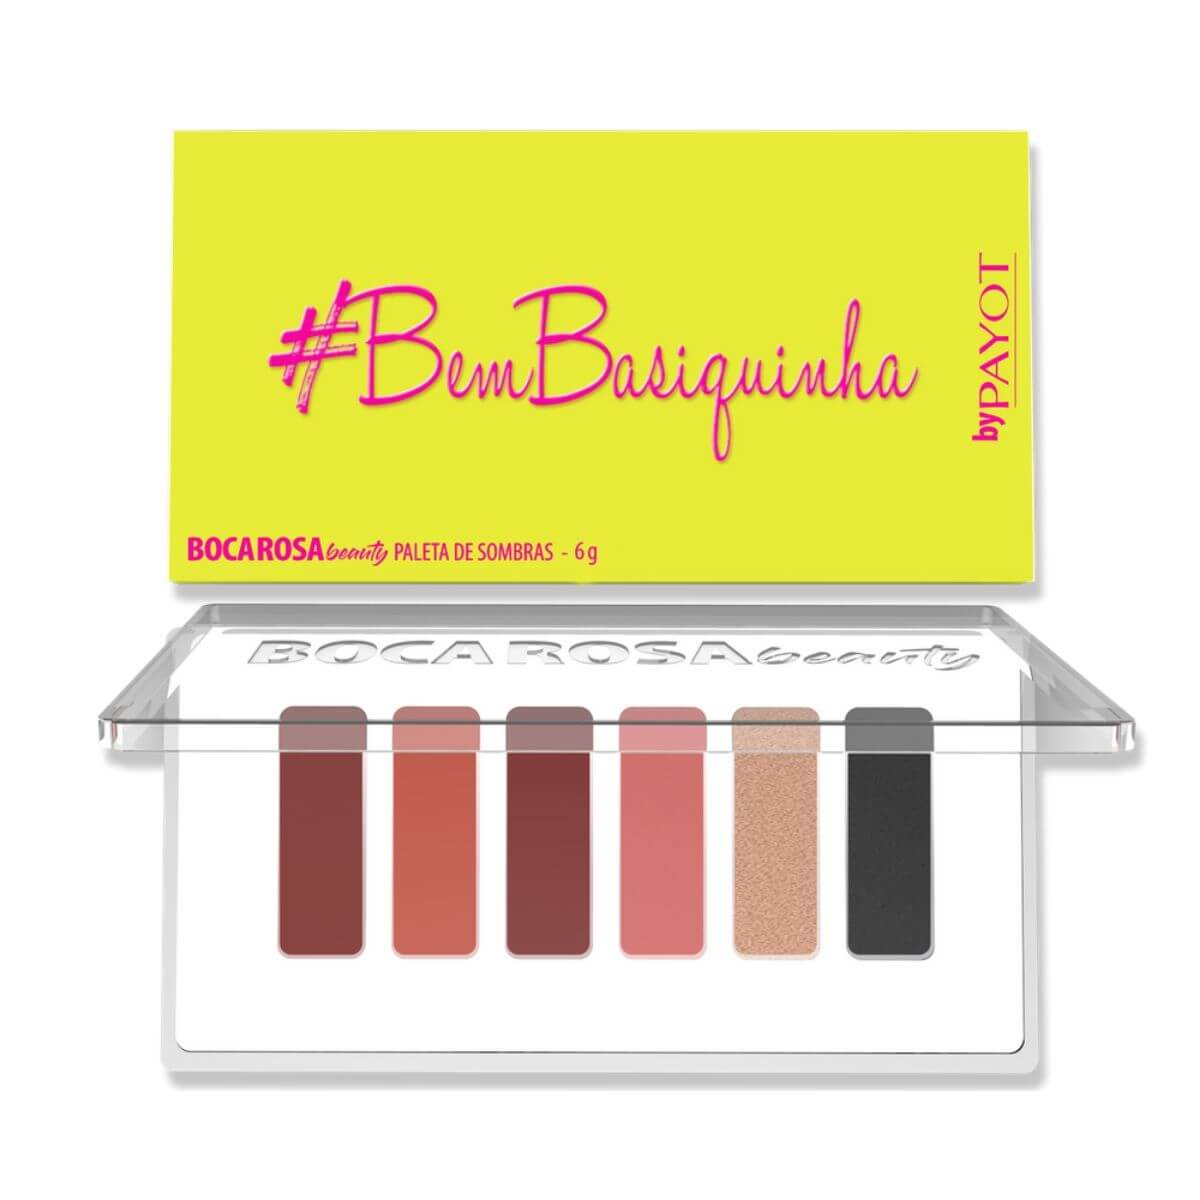 Paleta de Sombras Boca Rosa #BemBasiquinha - Payot